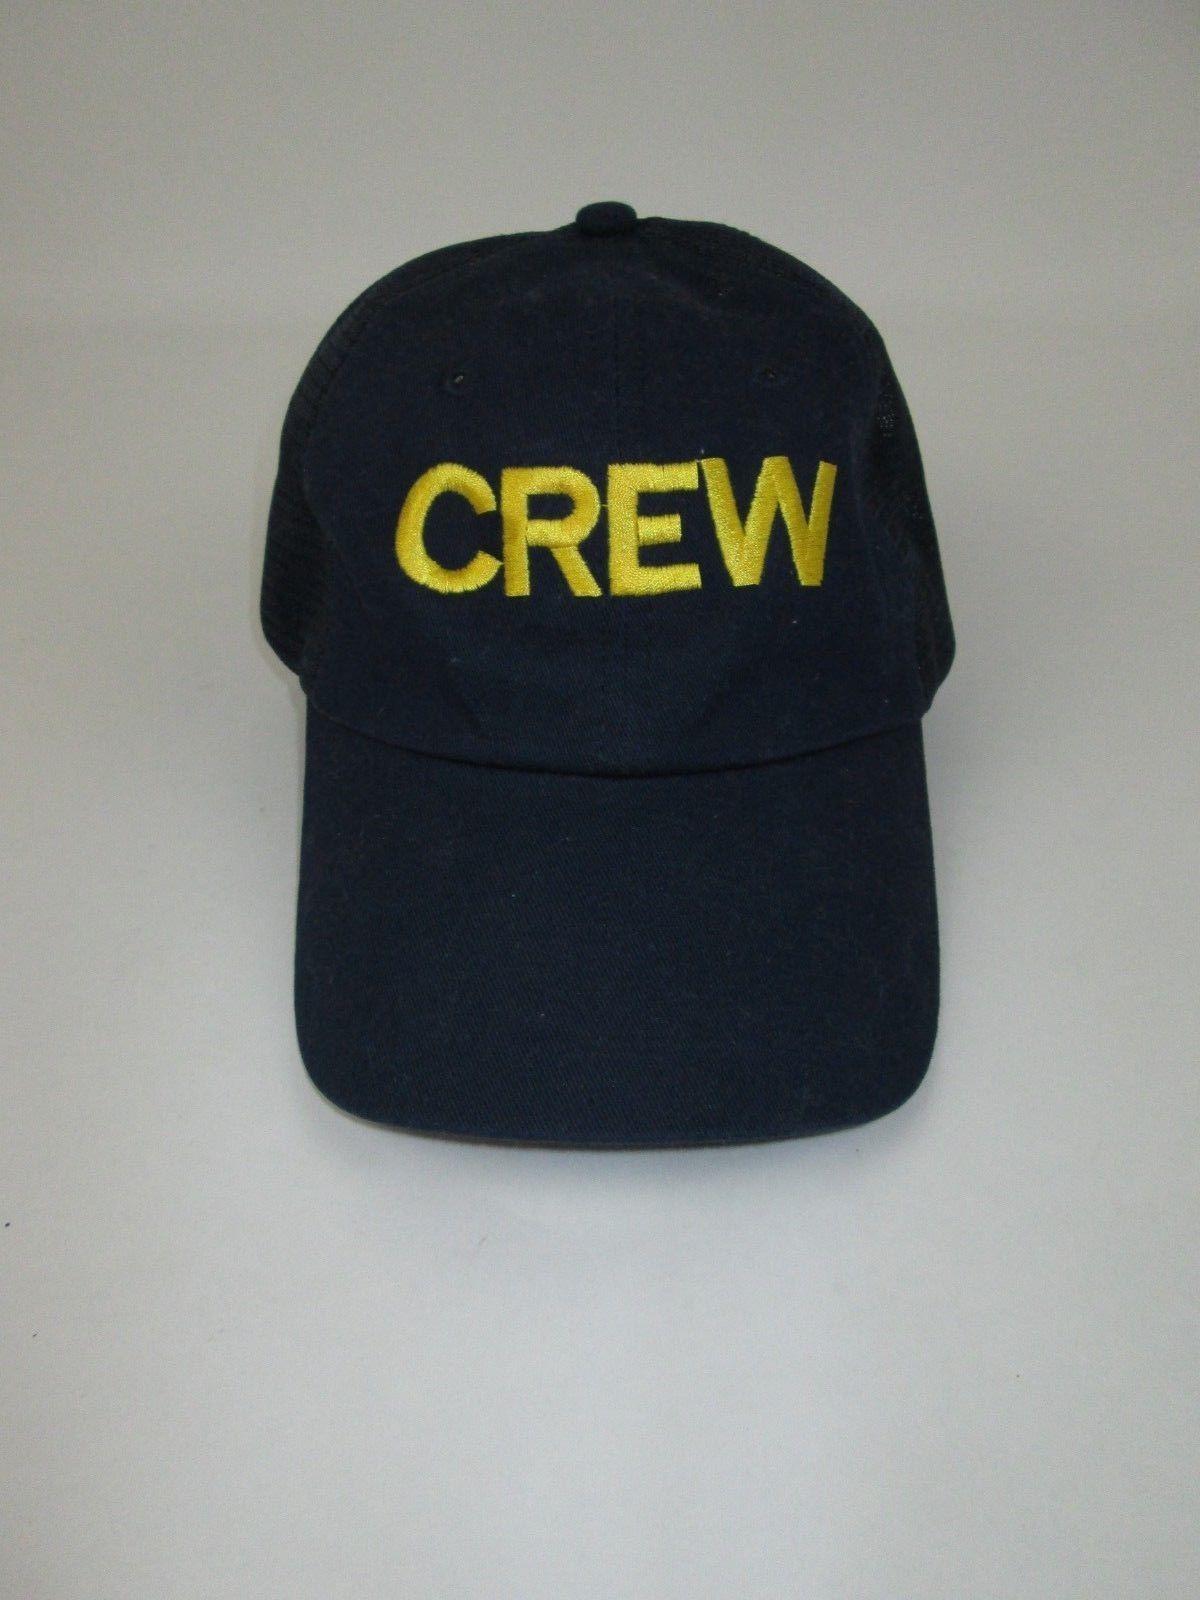 outlet store 1e3e5 83722 Men s CREW Mesh Back Trucker Hat Cap Navy and 50 similar items